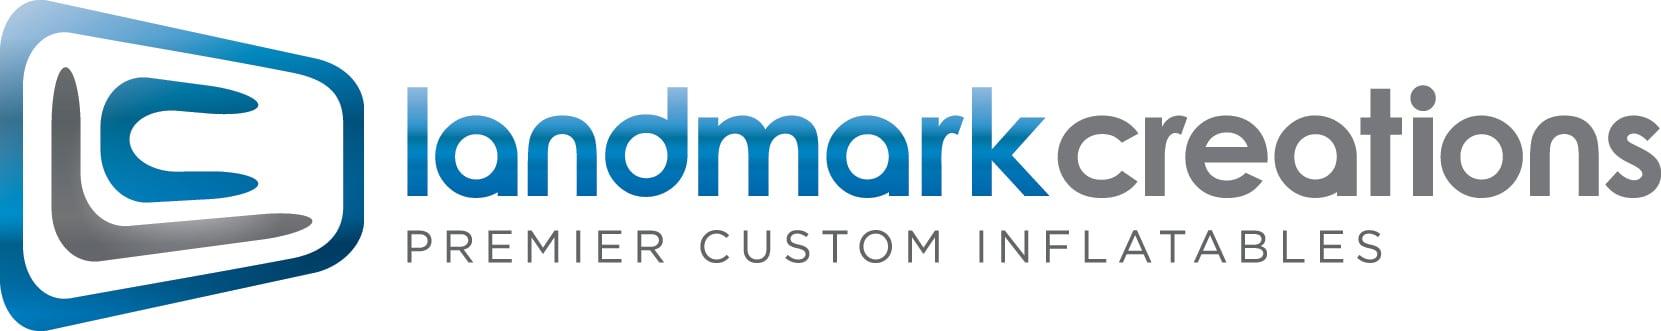 Landmark Creations | Premier Custom Inflatables